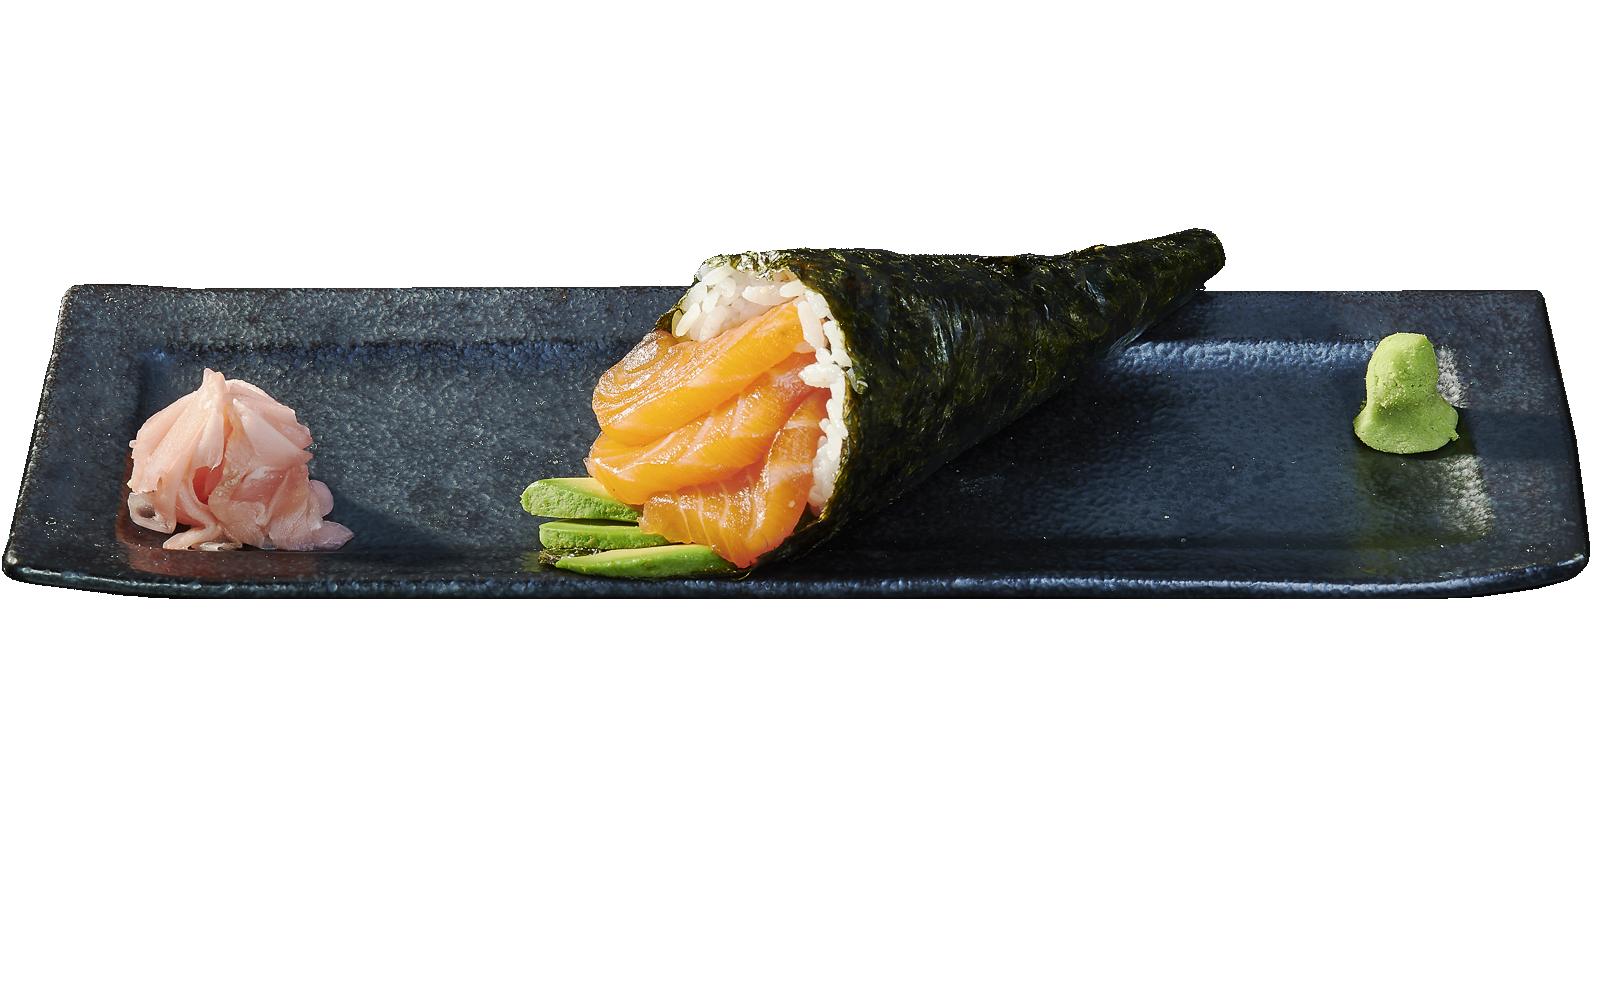 Temaki Salmon and Avocado